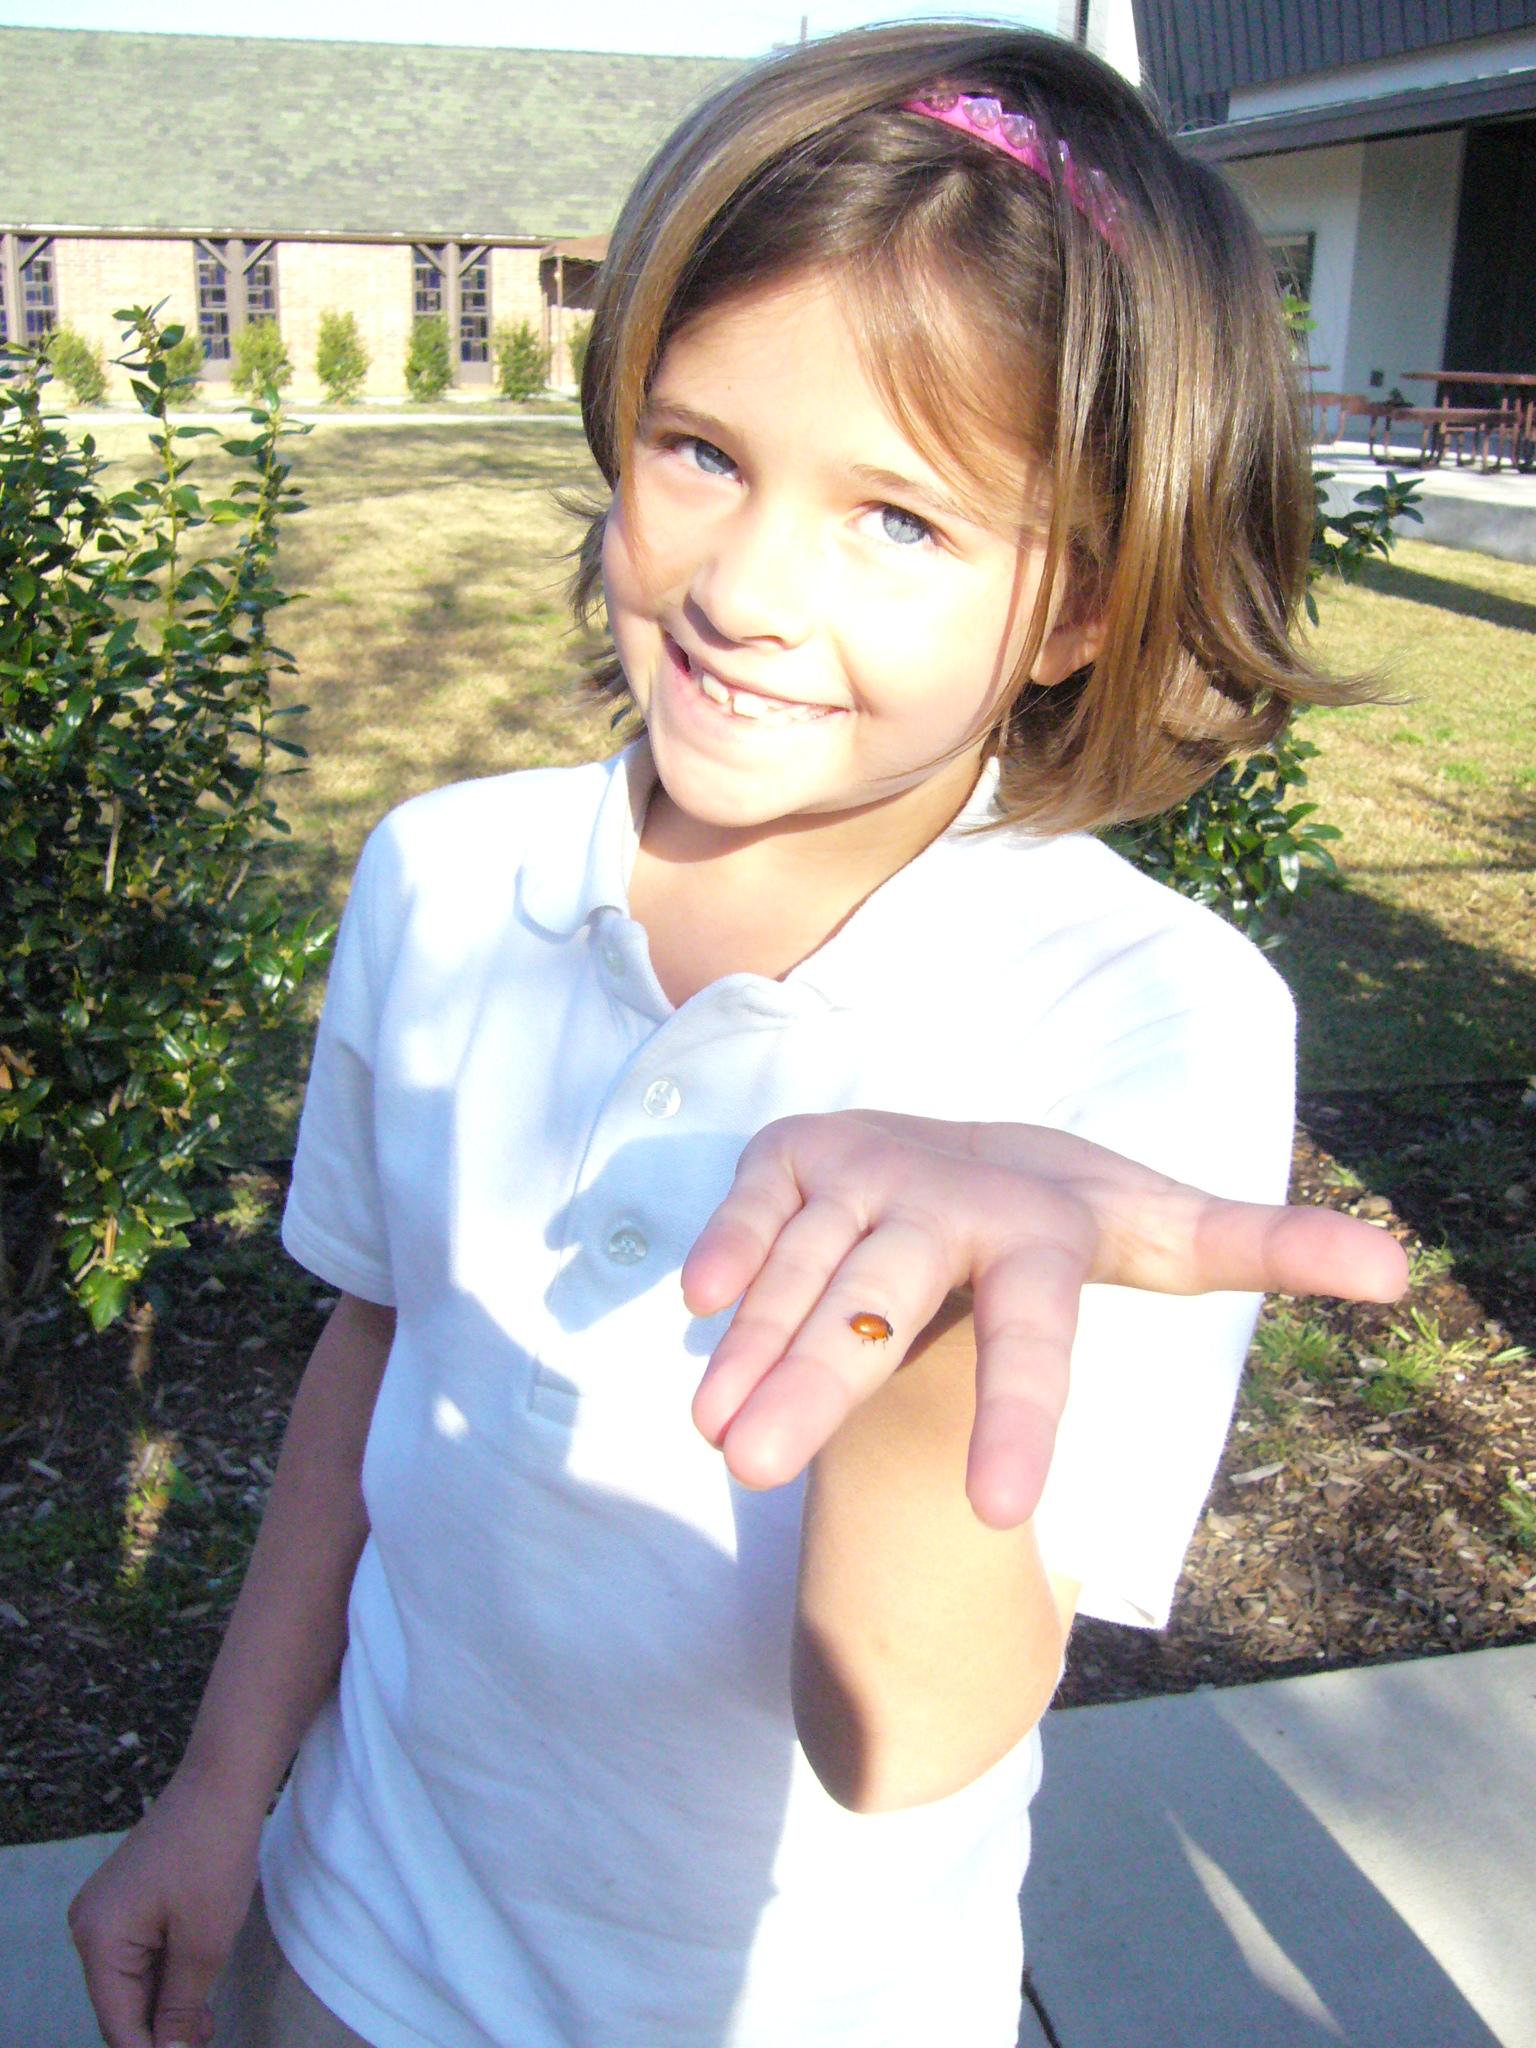 Redeemer Montessori School - Elementary, Grades 1-6